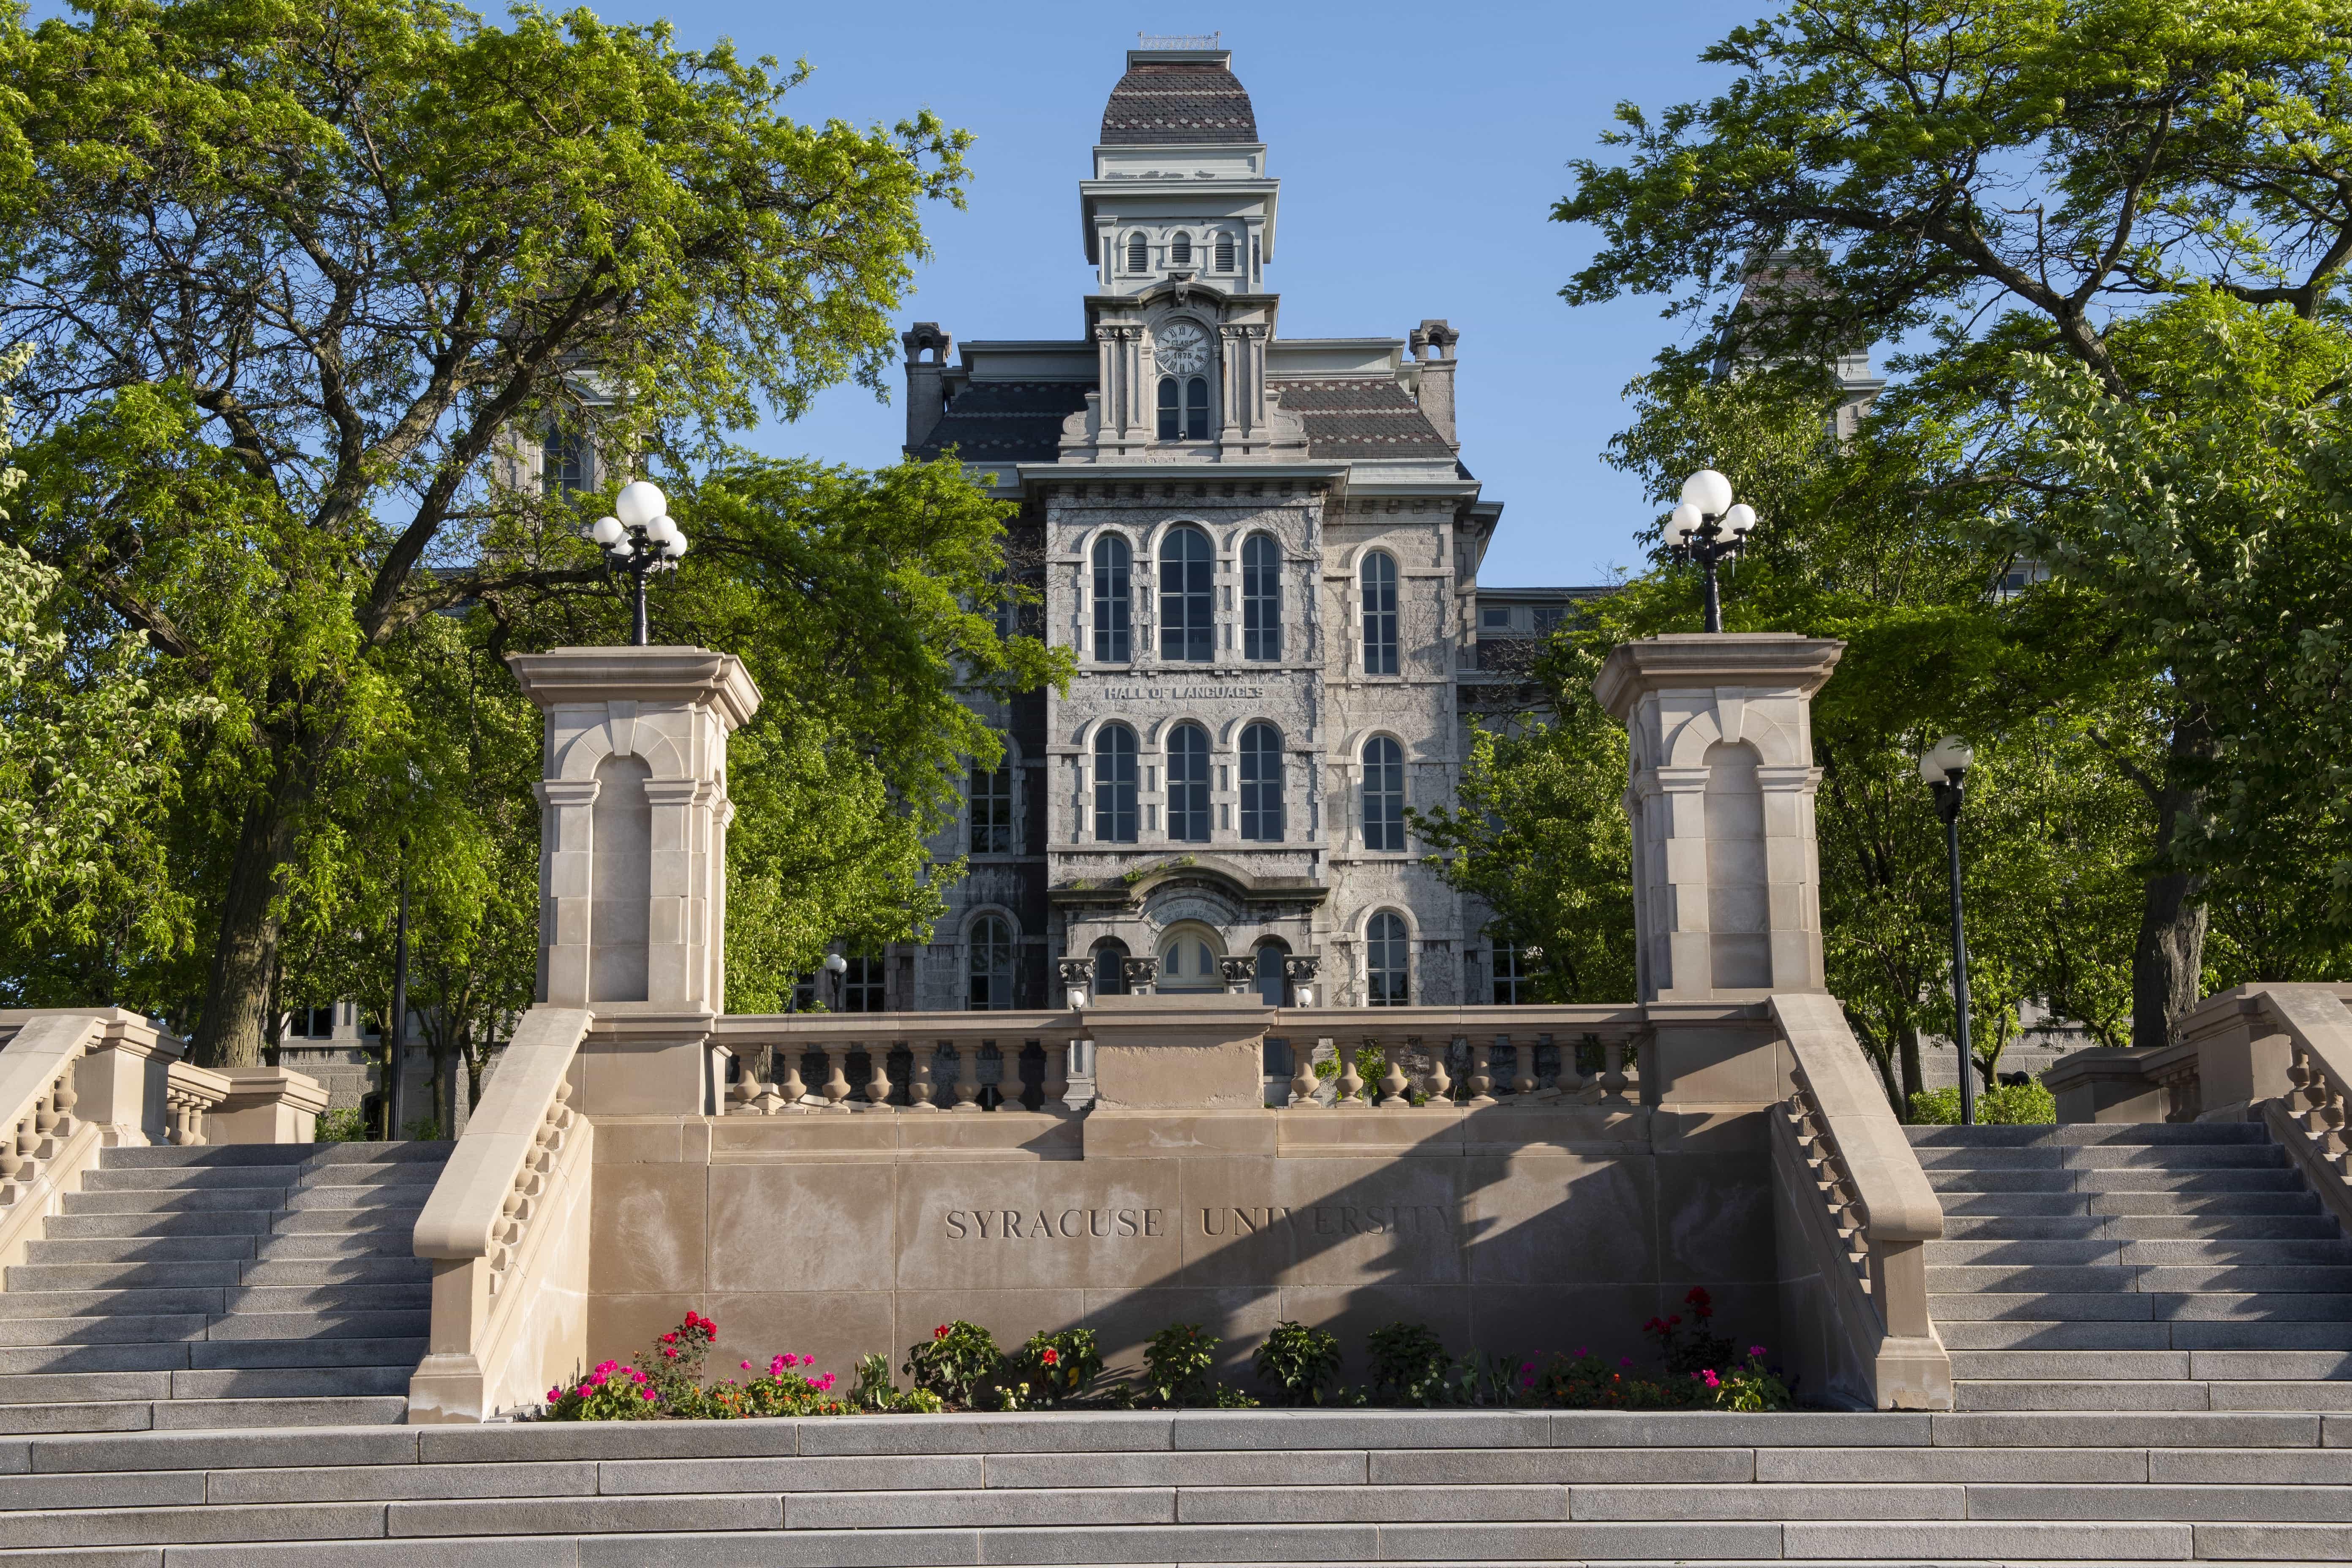 Syracuse University's Hall of Languages